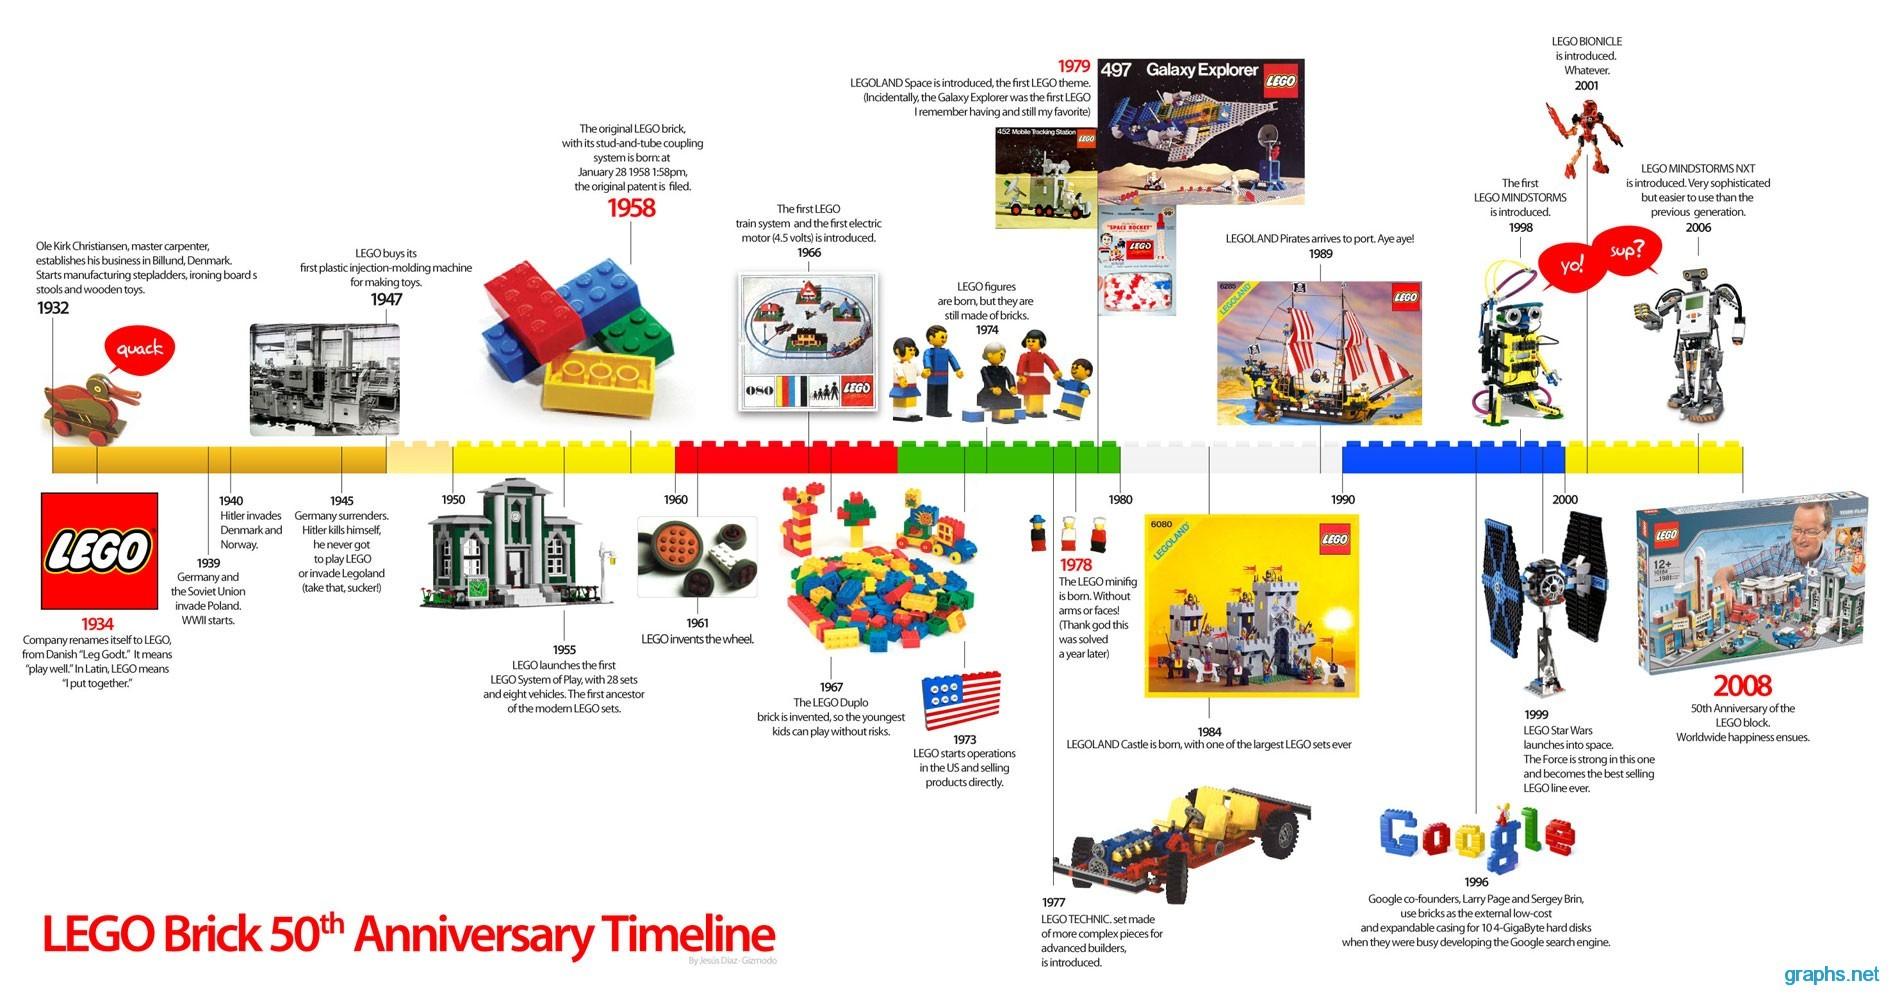 Lego Brick 50th Anniversary Timeline